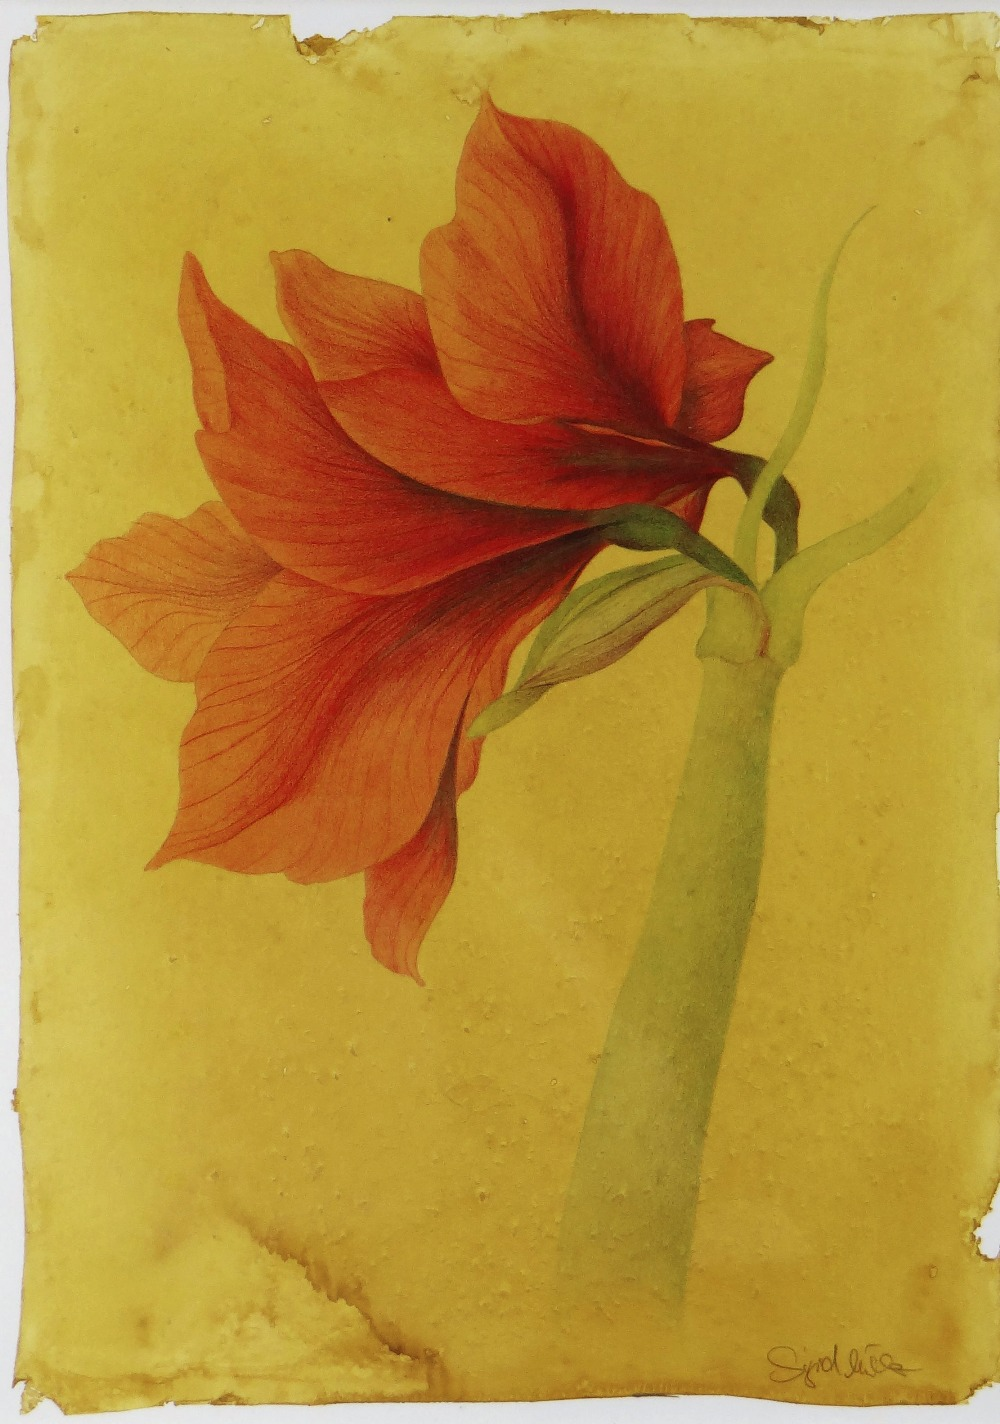 SIGRID MULLER mixed media - entitled verso on Attic Gallery Swansea label 'Amaryllis Study', signed, - Image 4 of 5